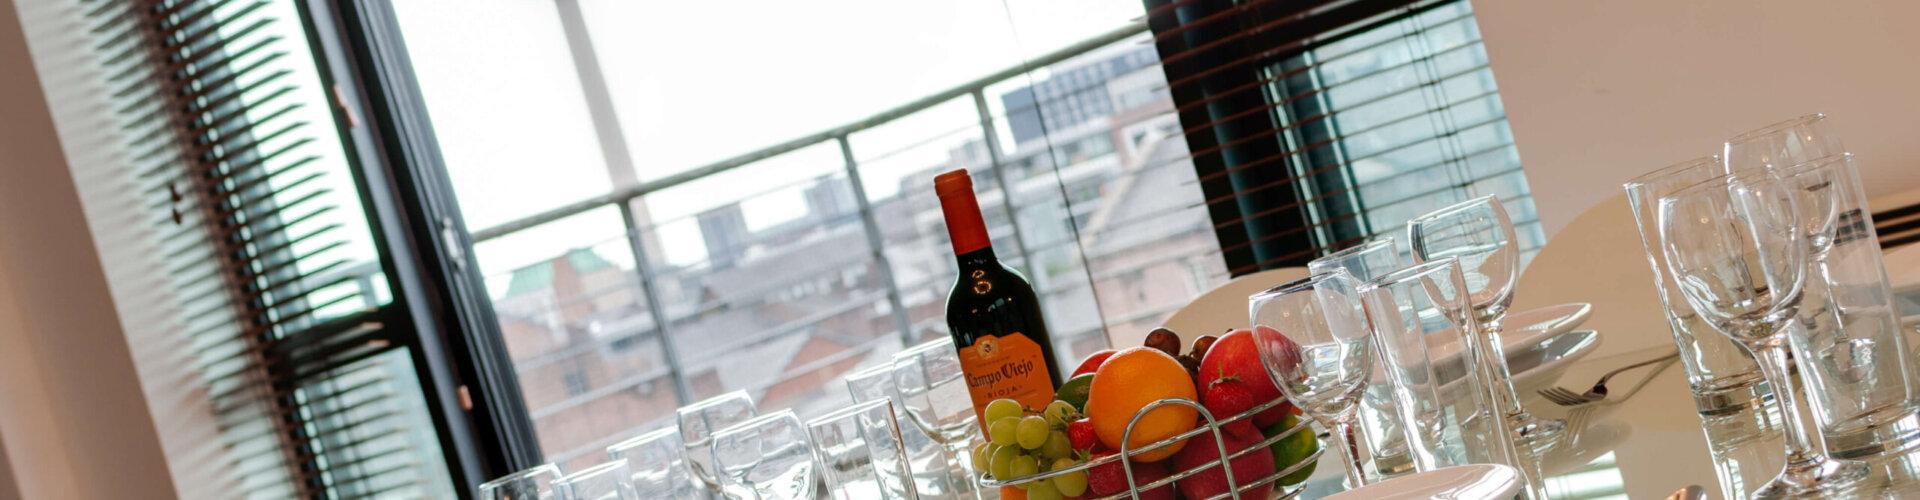 Dining Table Duke Street Apartment Liverpool